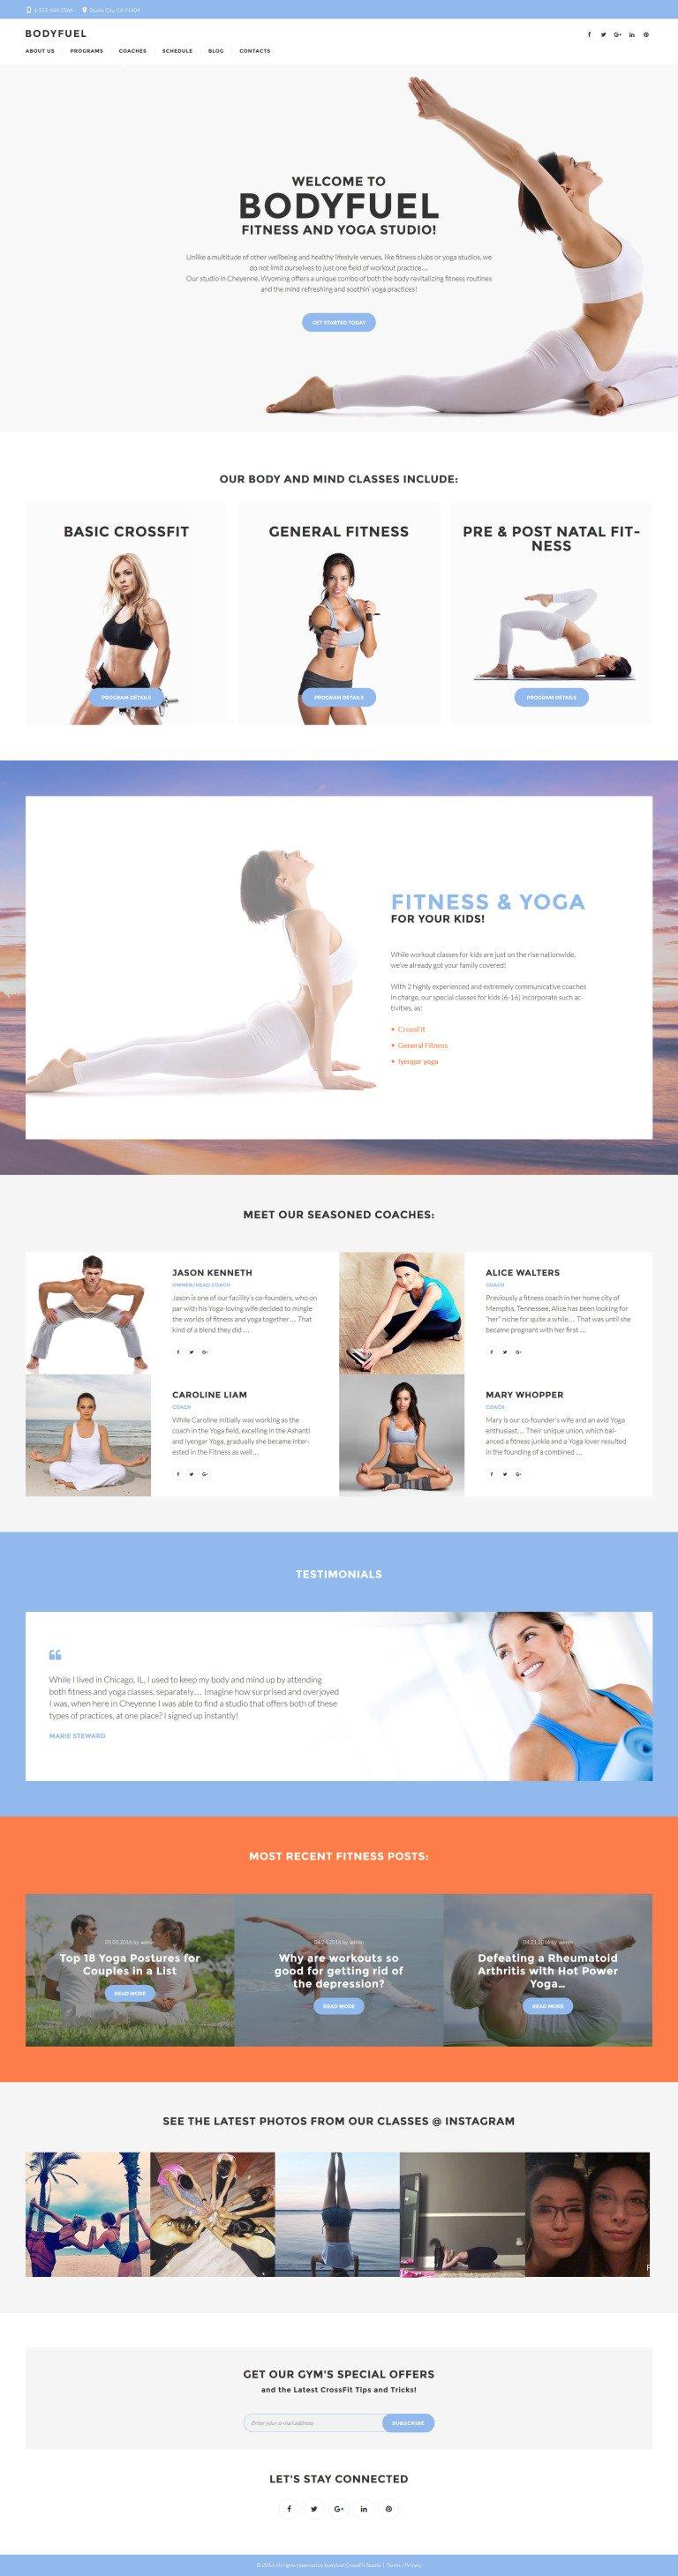 BodyFuel - Fitness & Yoga WordPress Theme New Screenshots BIG